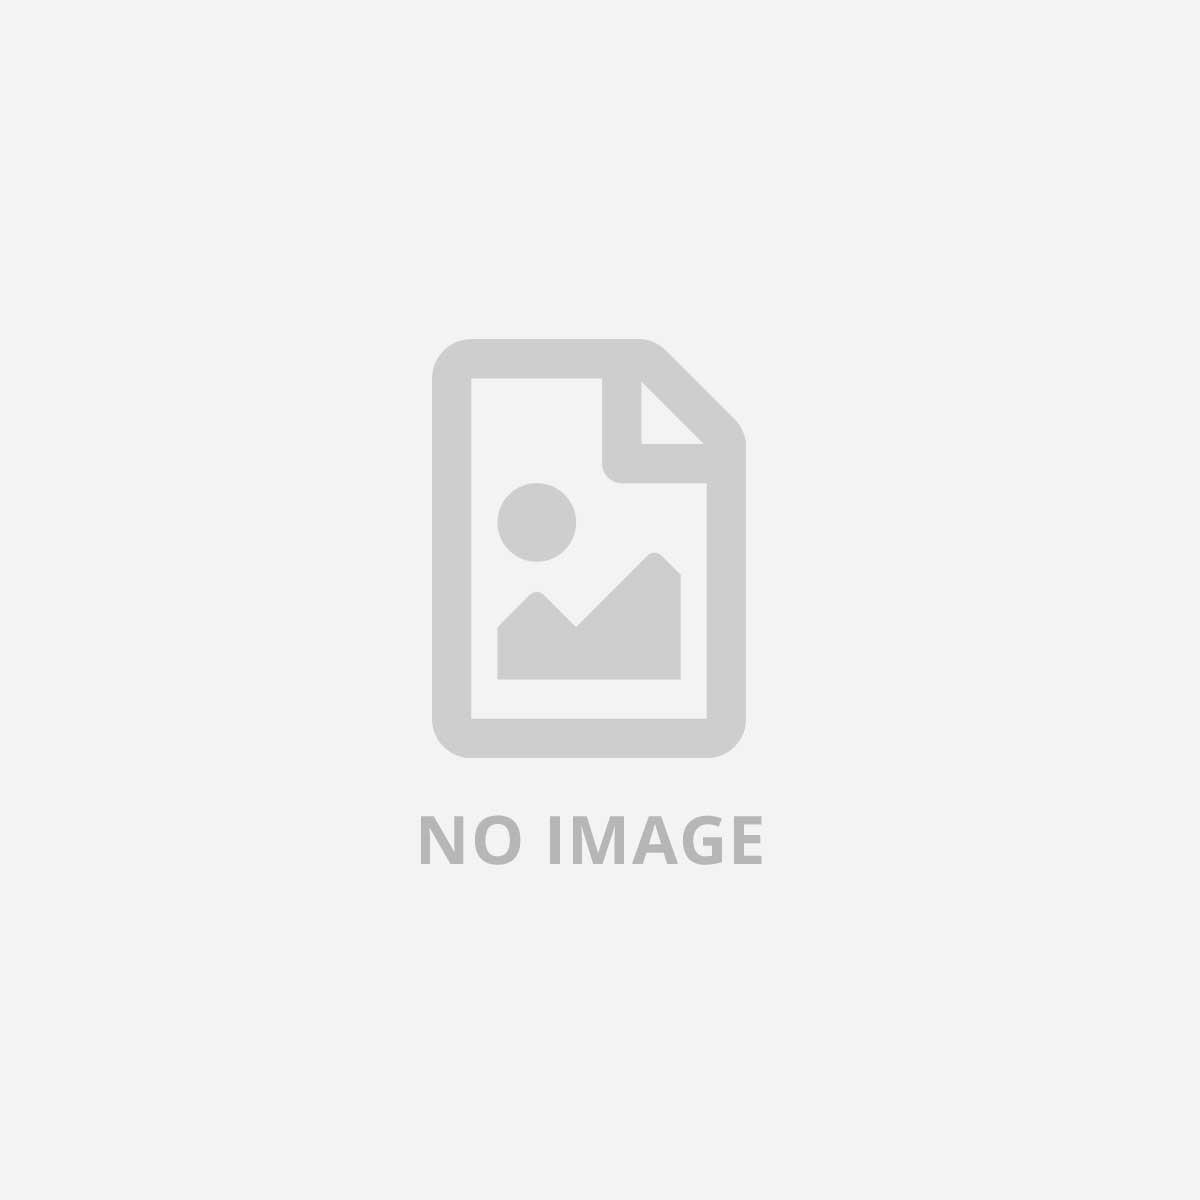 POLYCOM SOUNDSTATION IP6000 CONF PHONE